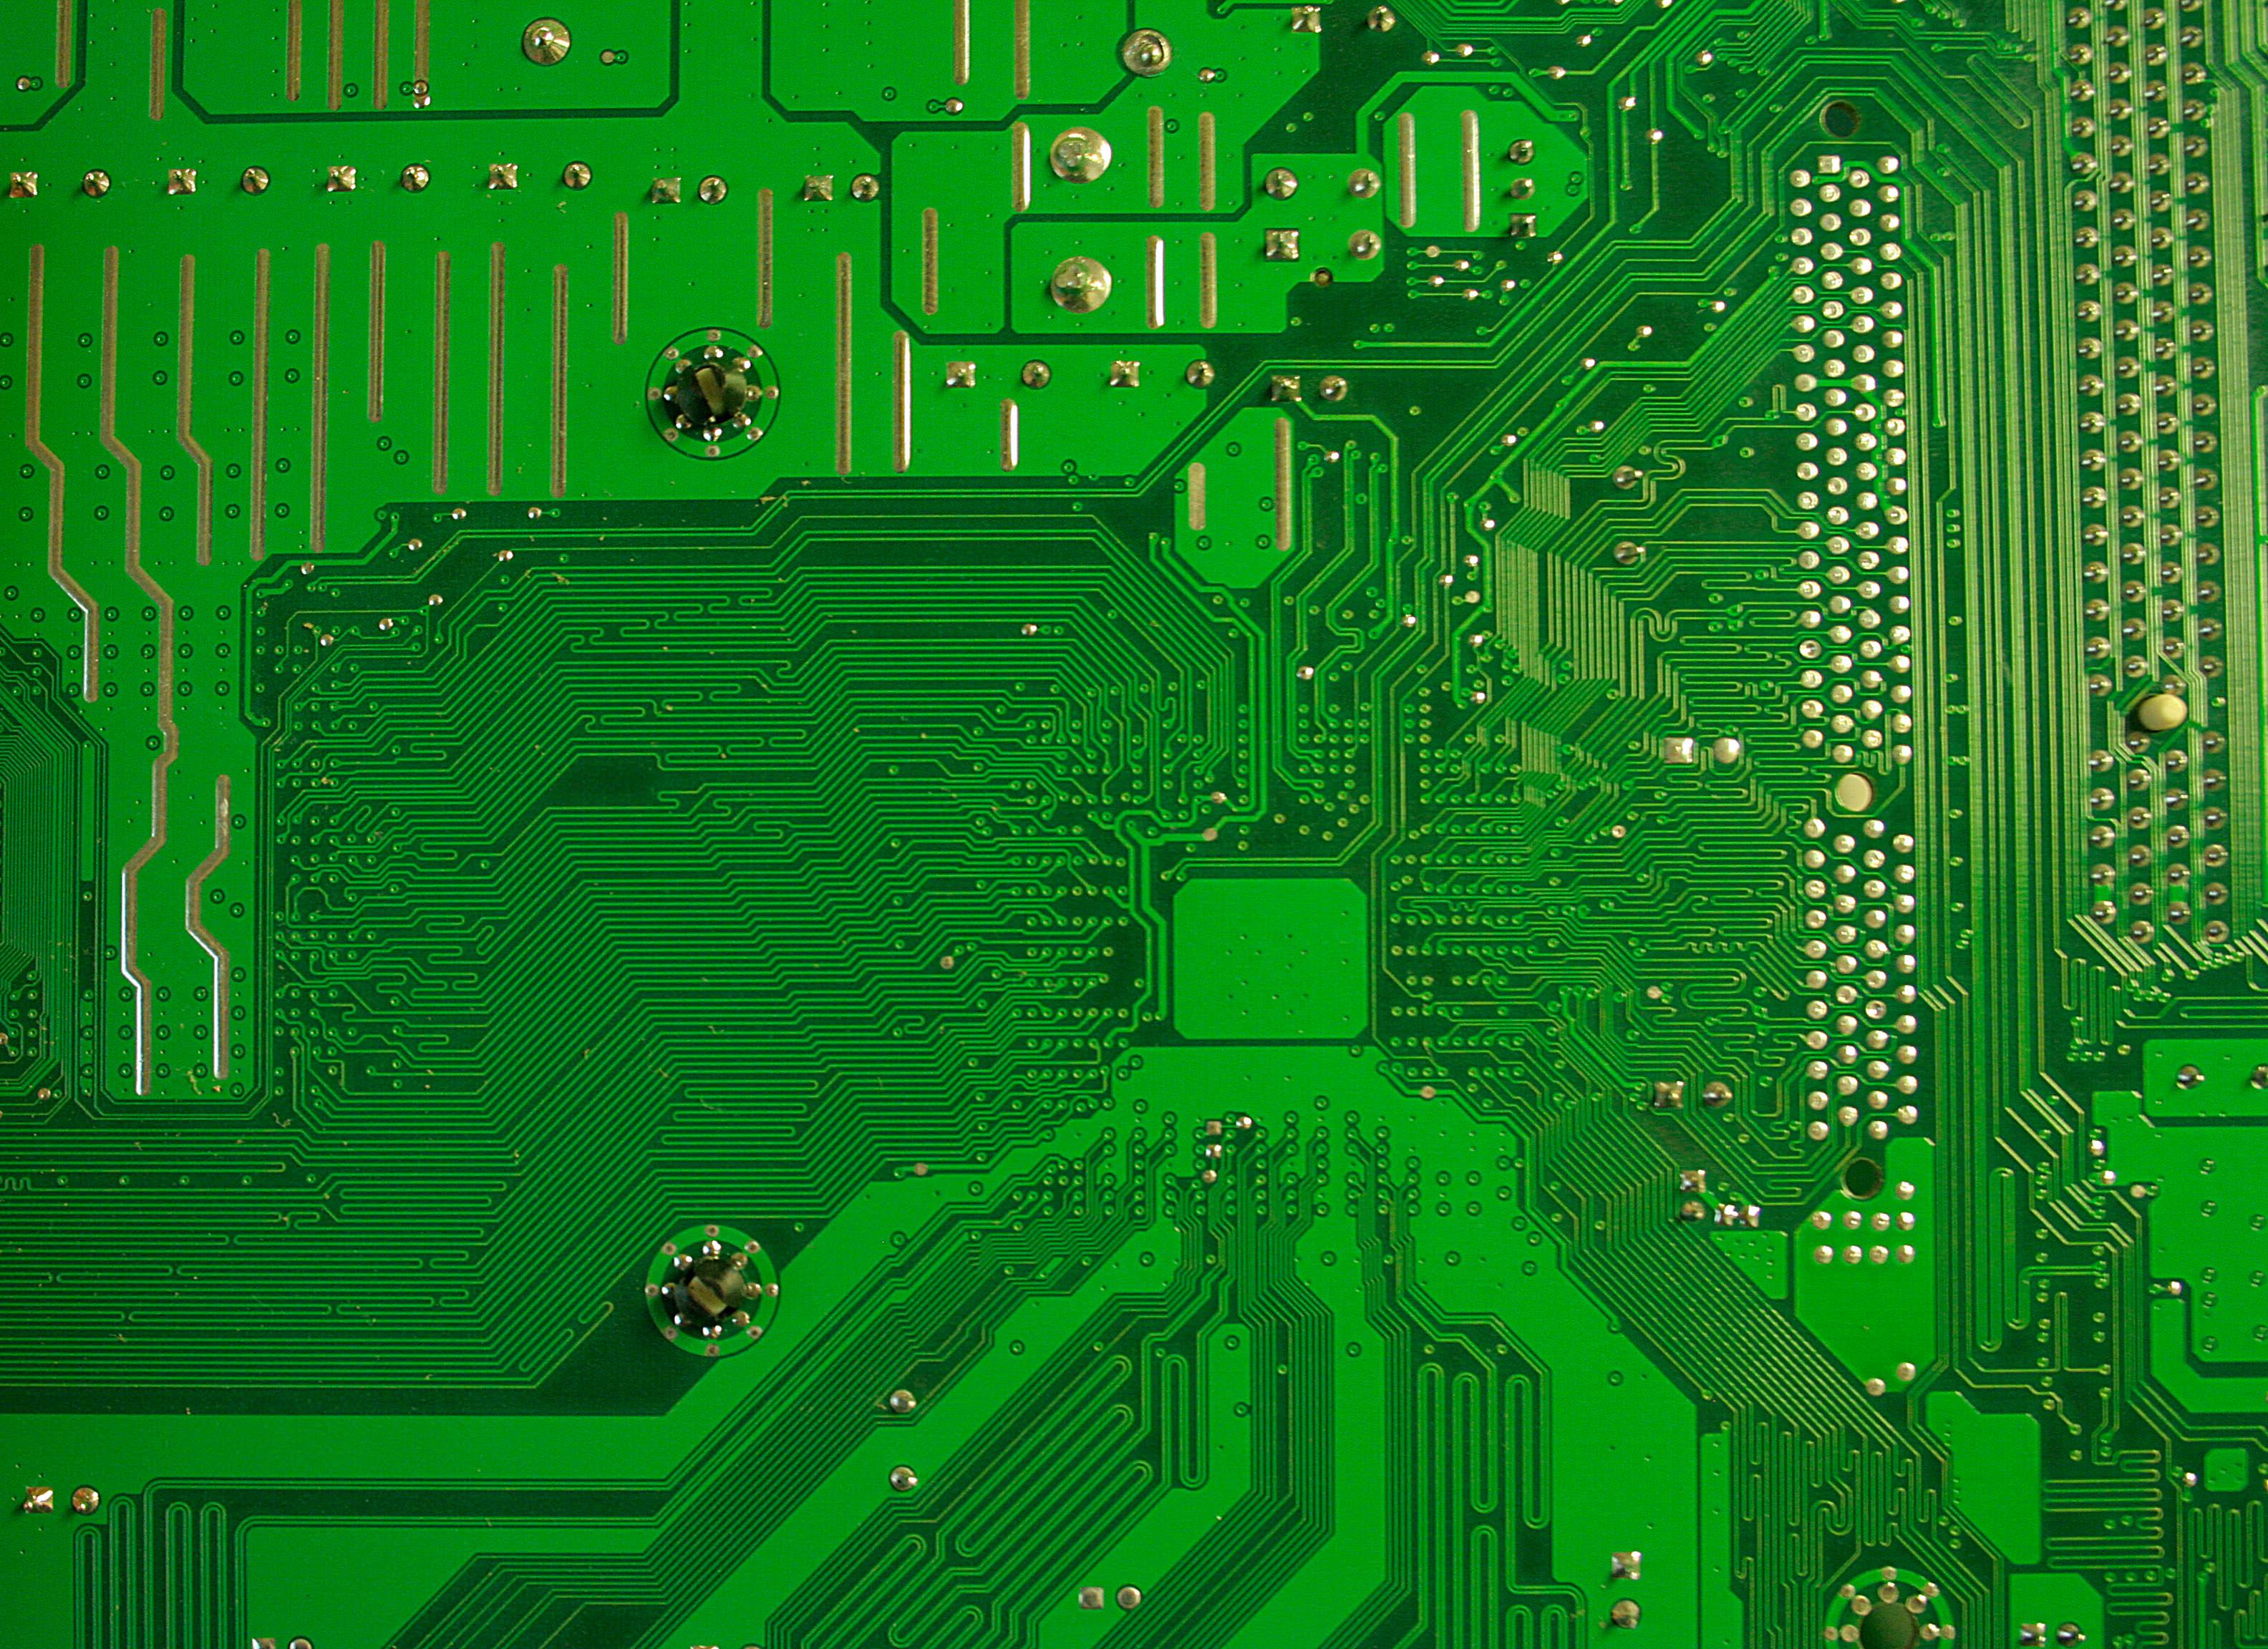 Green Motherboard Texture